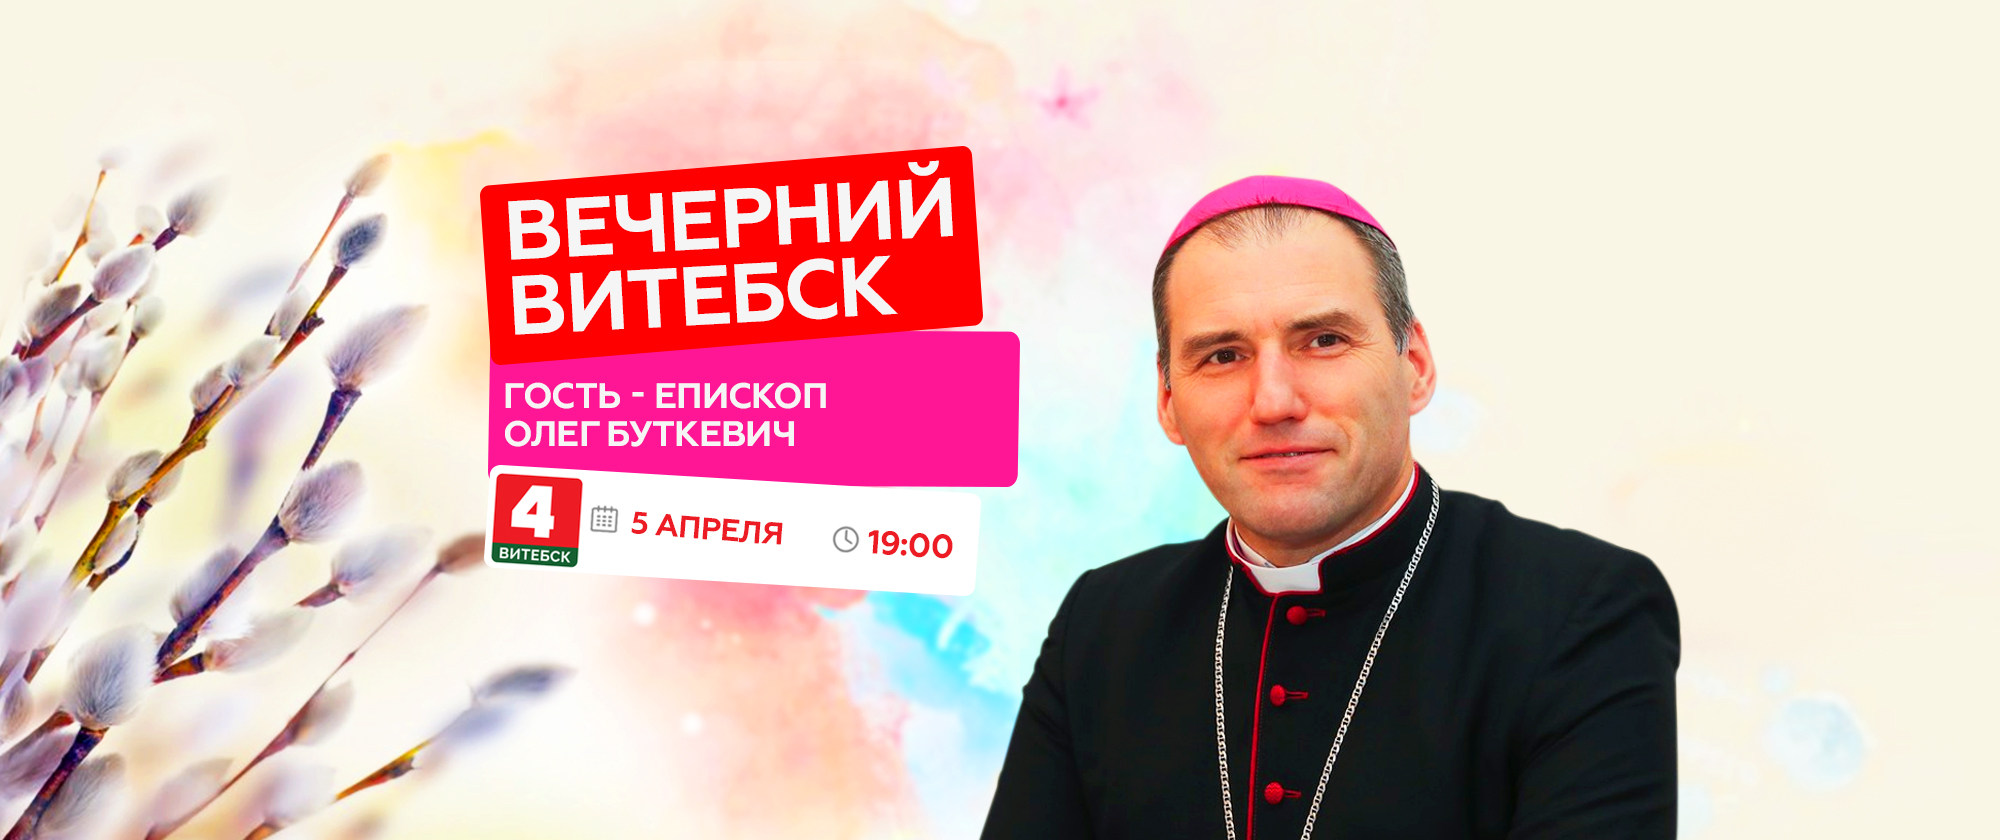 vechernij vitebsk 5 aprelja - Вечерний Витебск-5-апреля